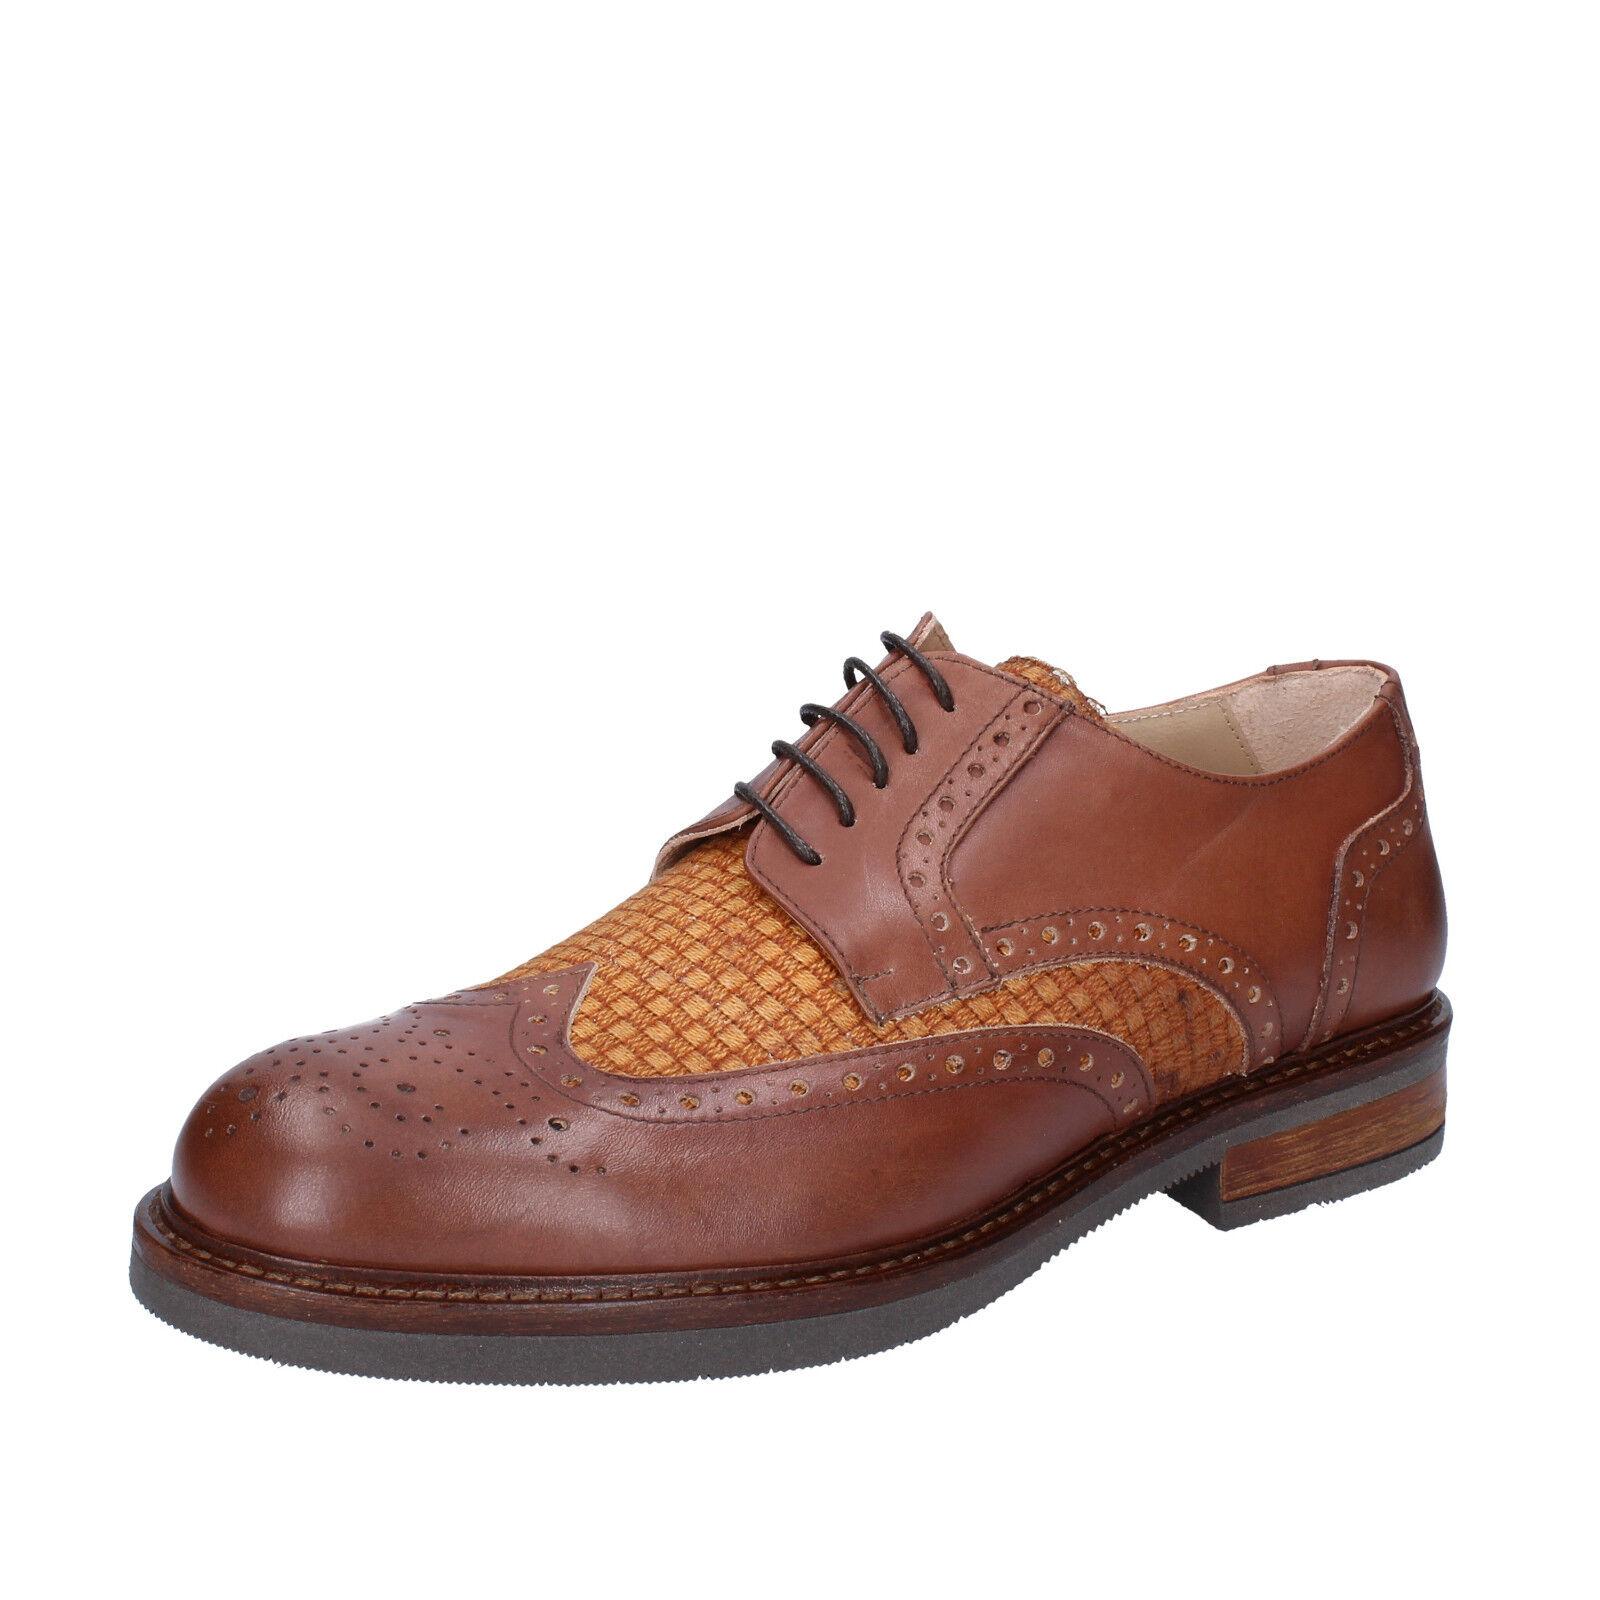 Herren schuhe FDF Schuhe 45 EU elegante braun leder textil BZ344-G